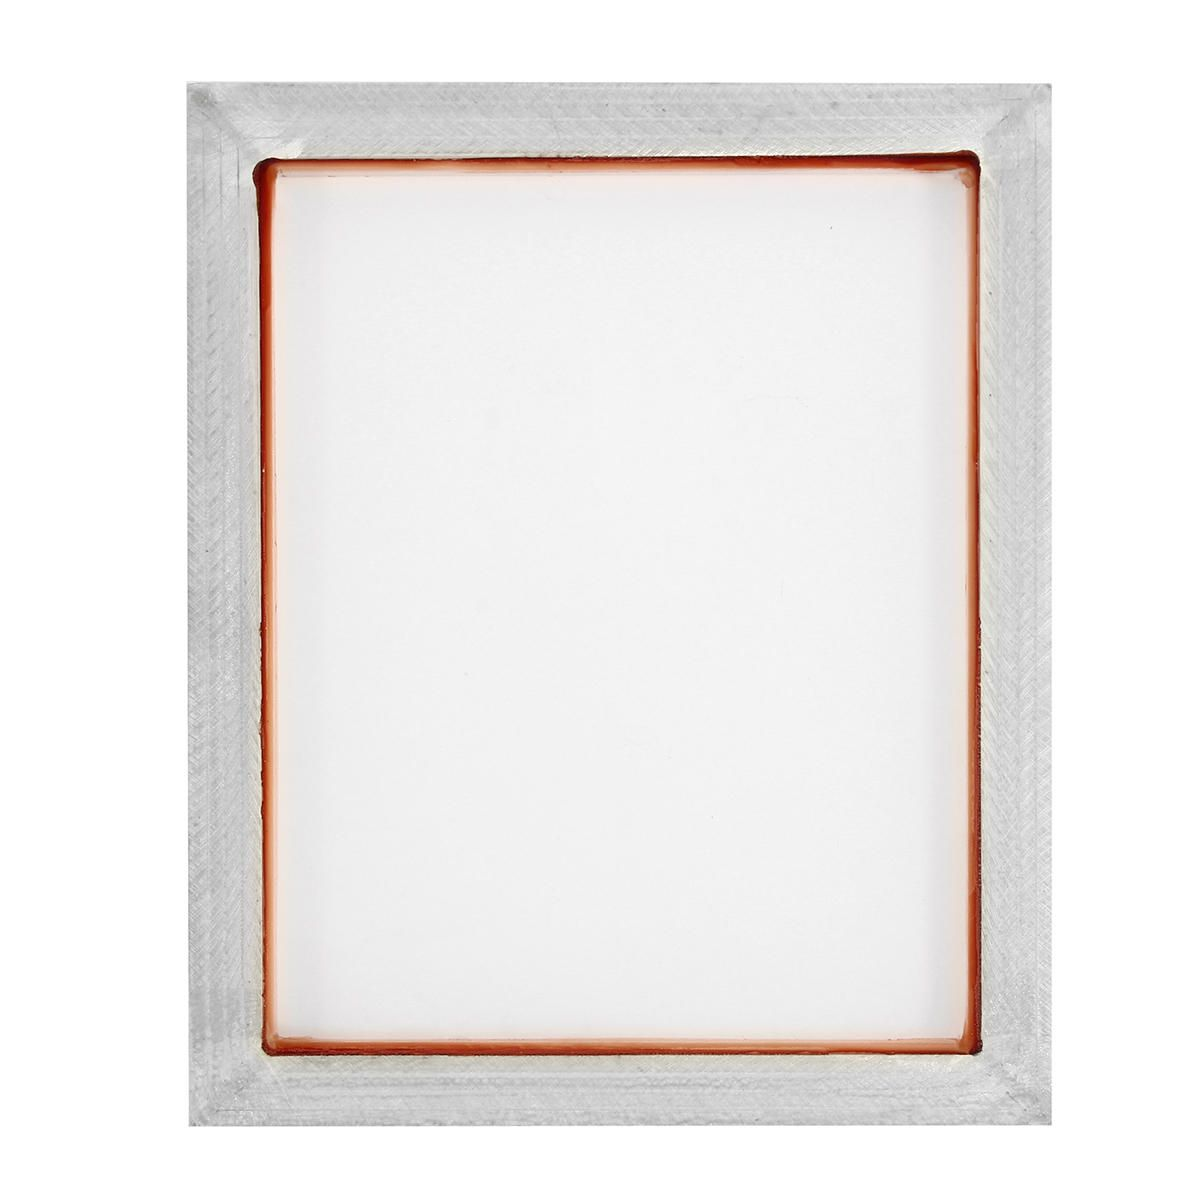 IDA US$53.90 6Pcs 14''x10'' Aluminium Alloy Silk Screen Printing Frame w 110 White Mesh Count